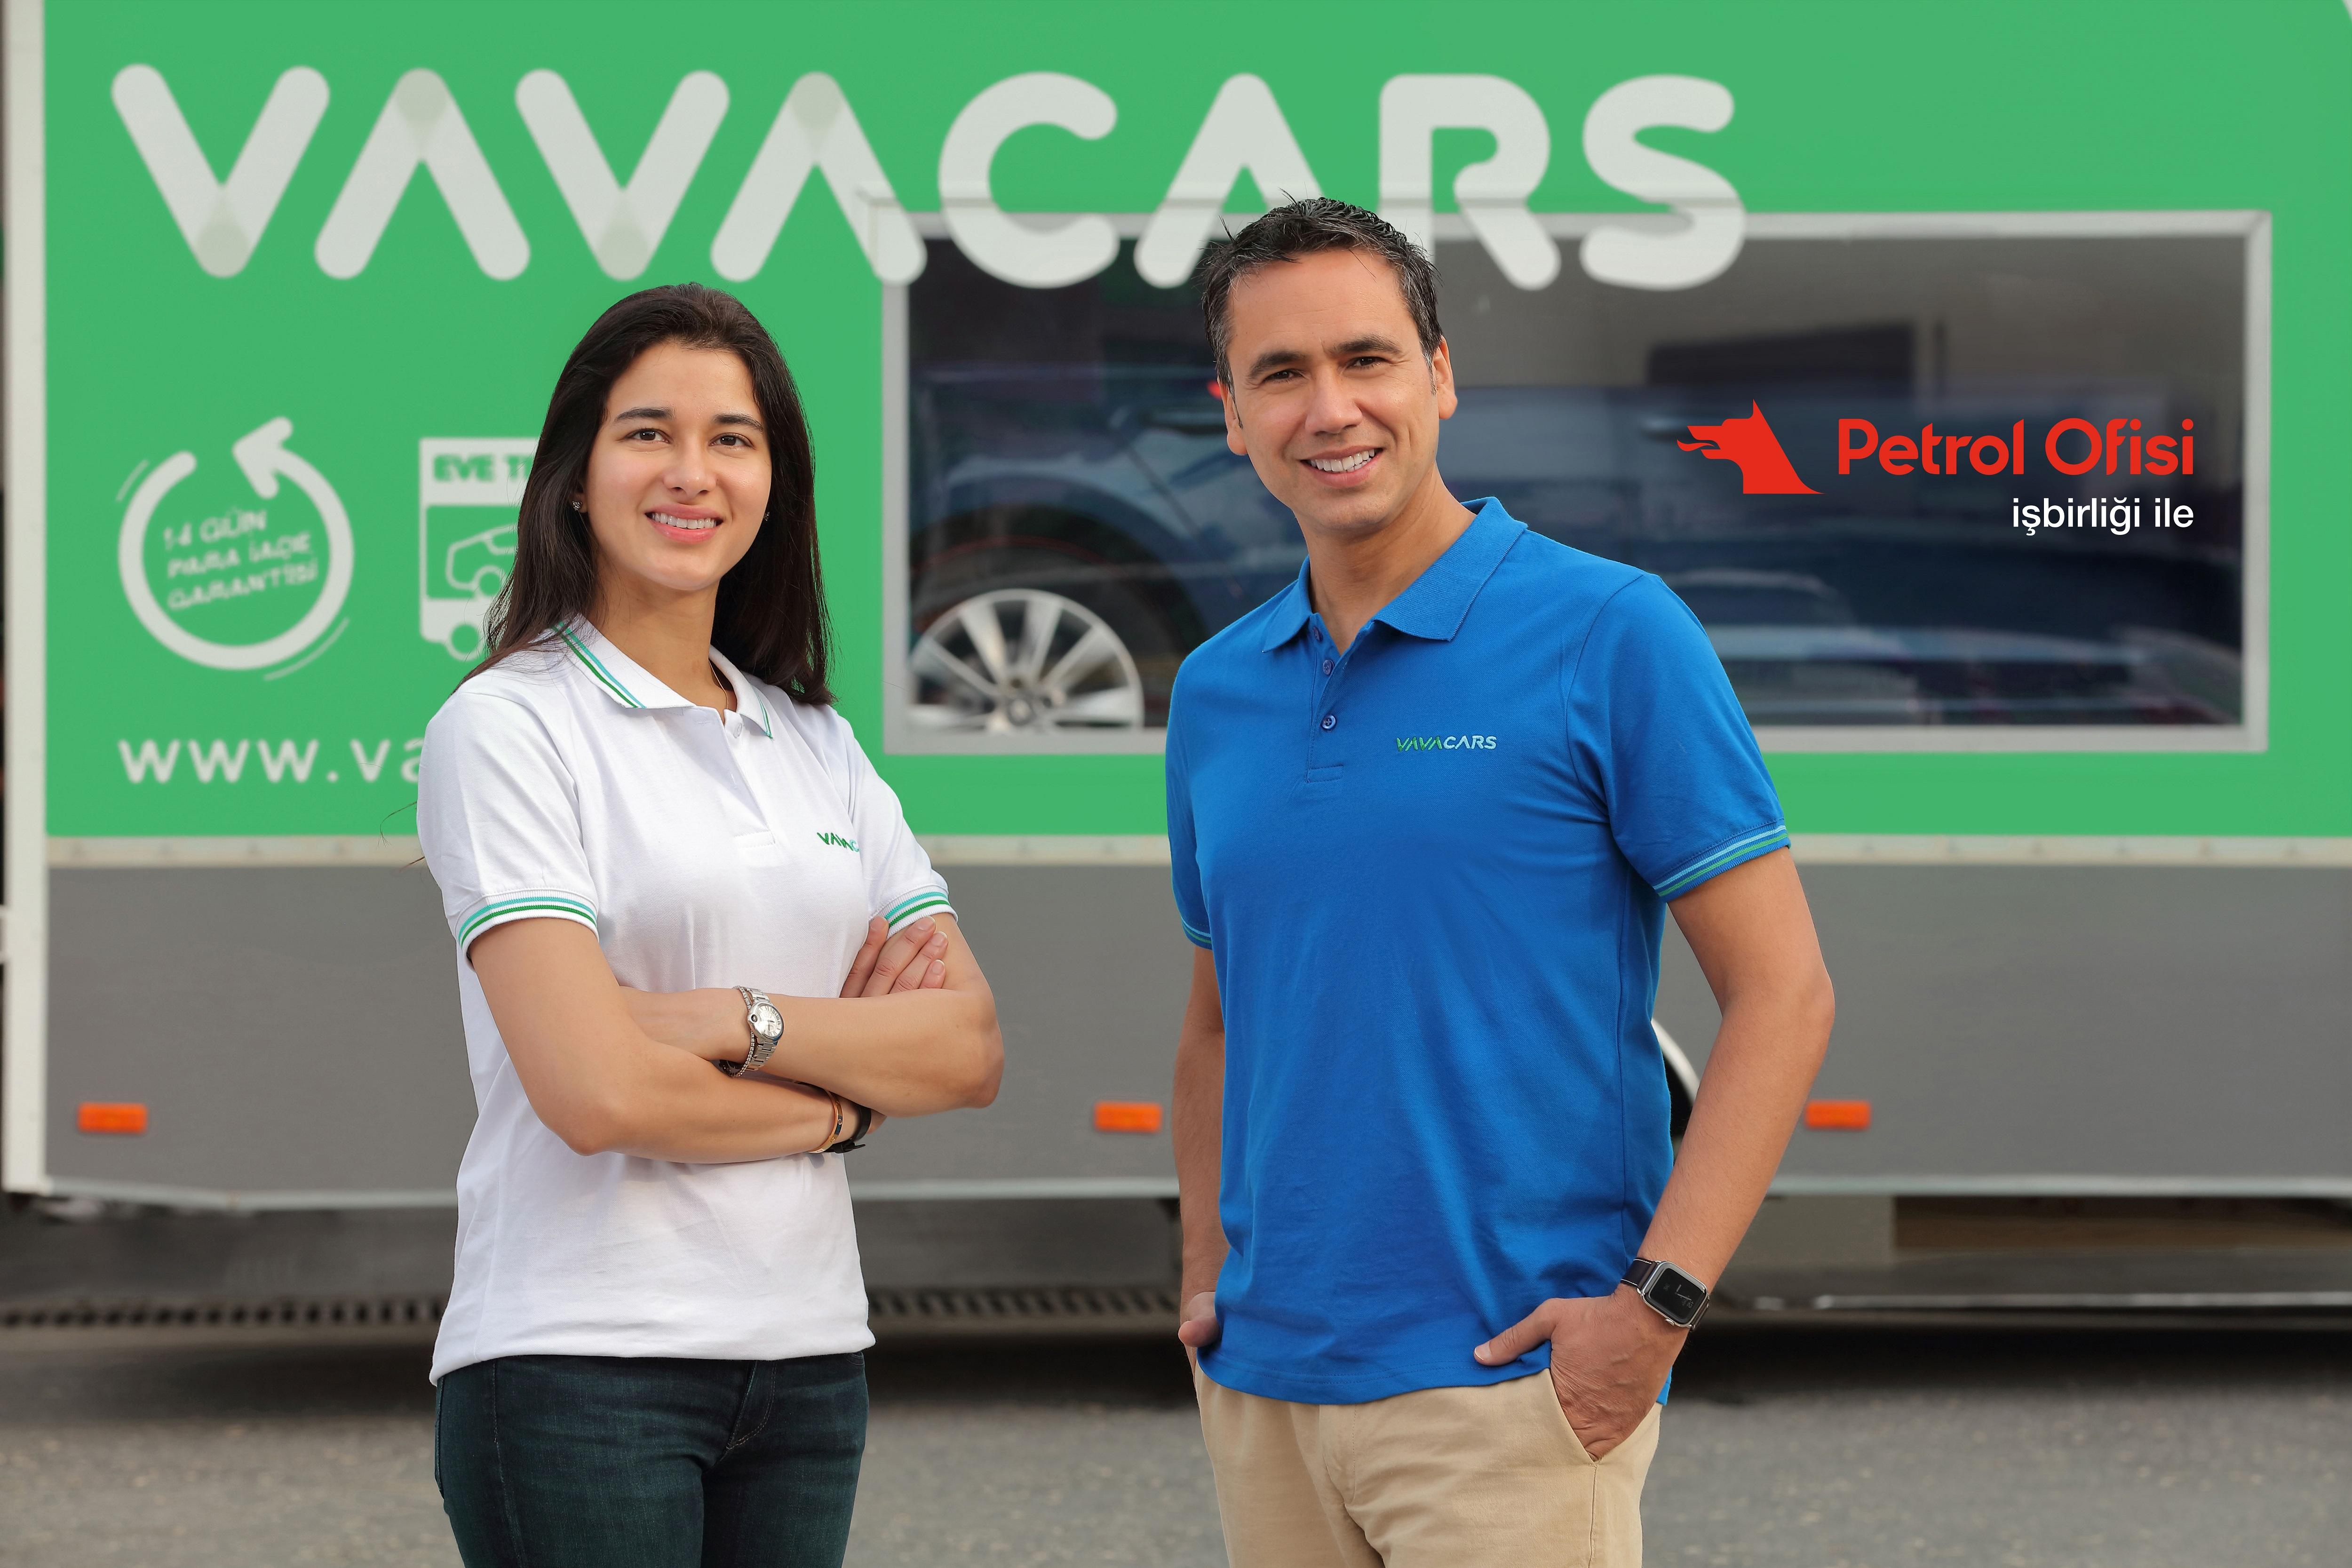 VavaCars raises 50 million in Series B to build presence in Turkey and Pakistan